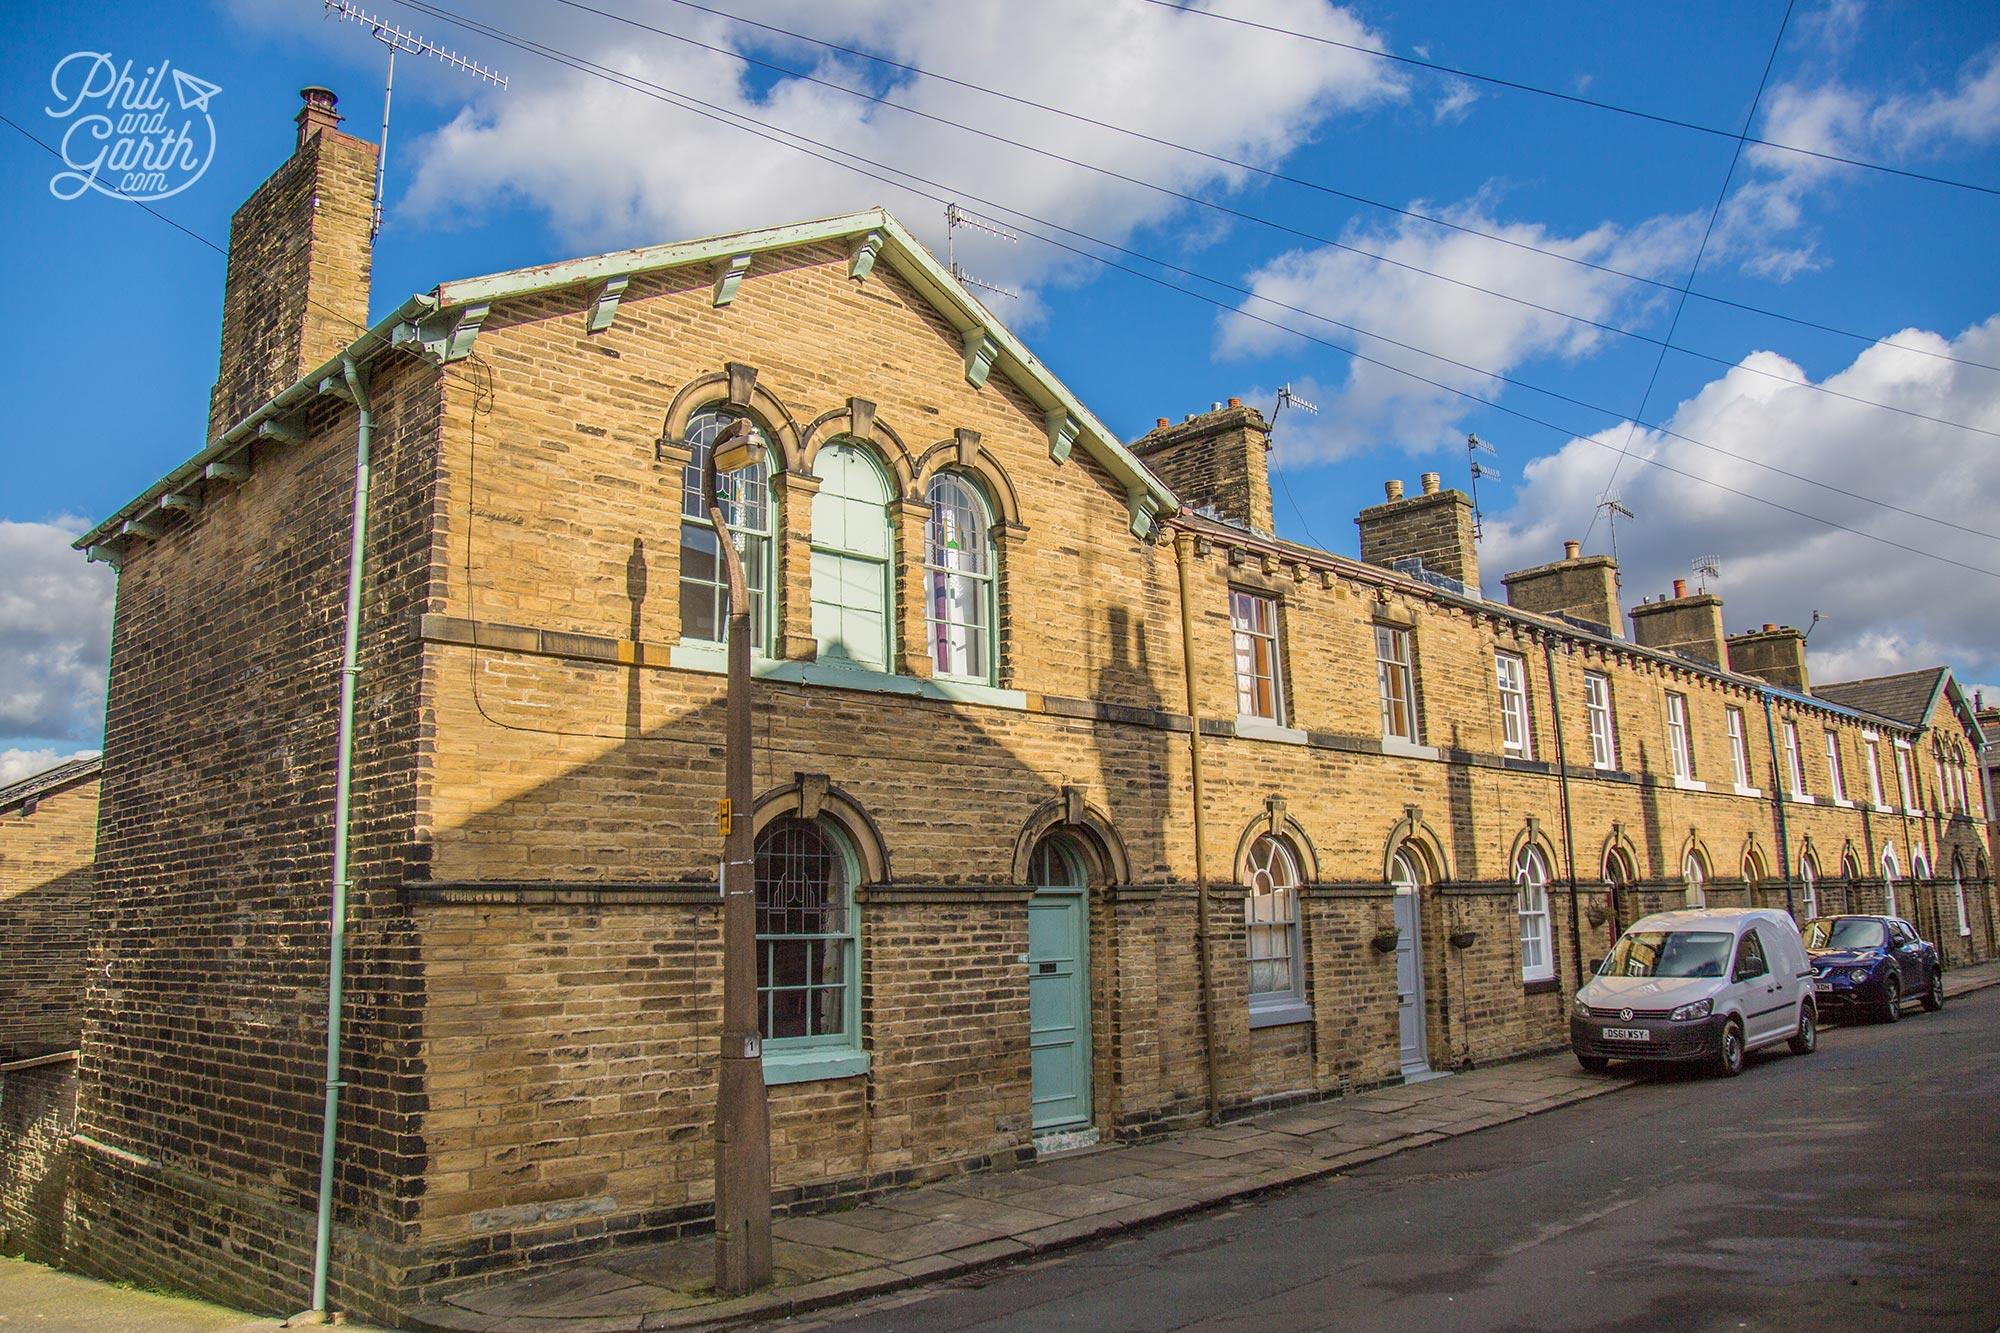 Saltaire houses near Bradford, England, UK